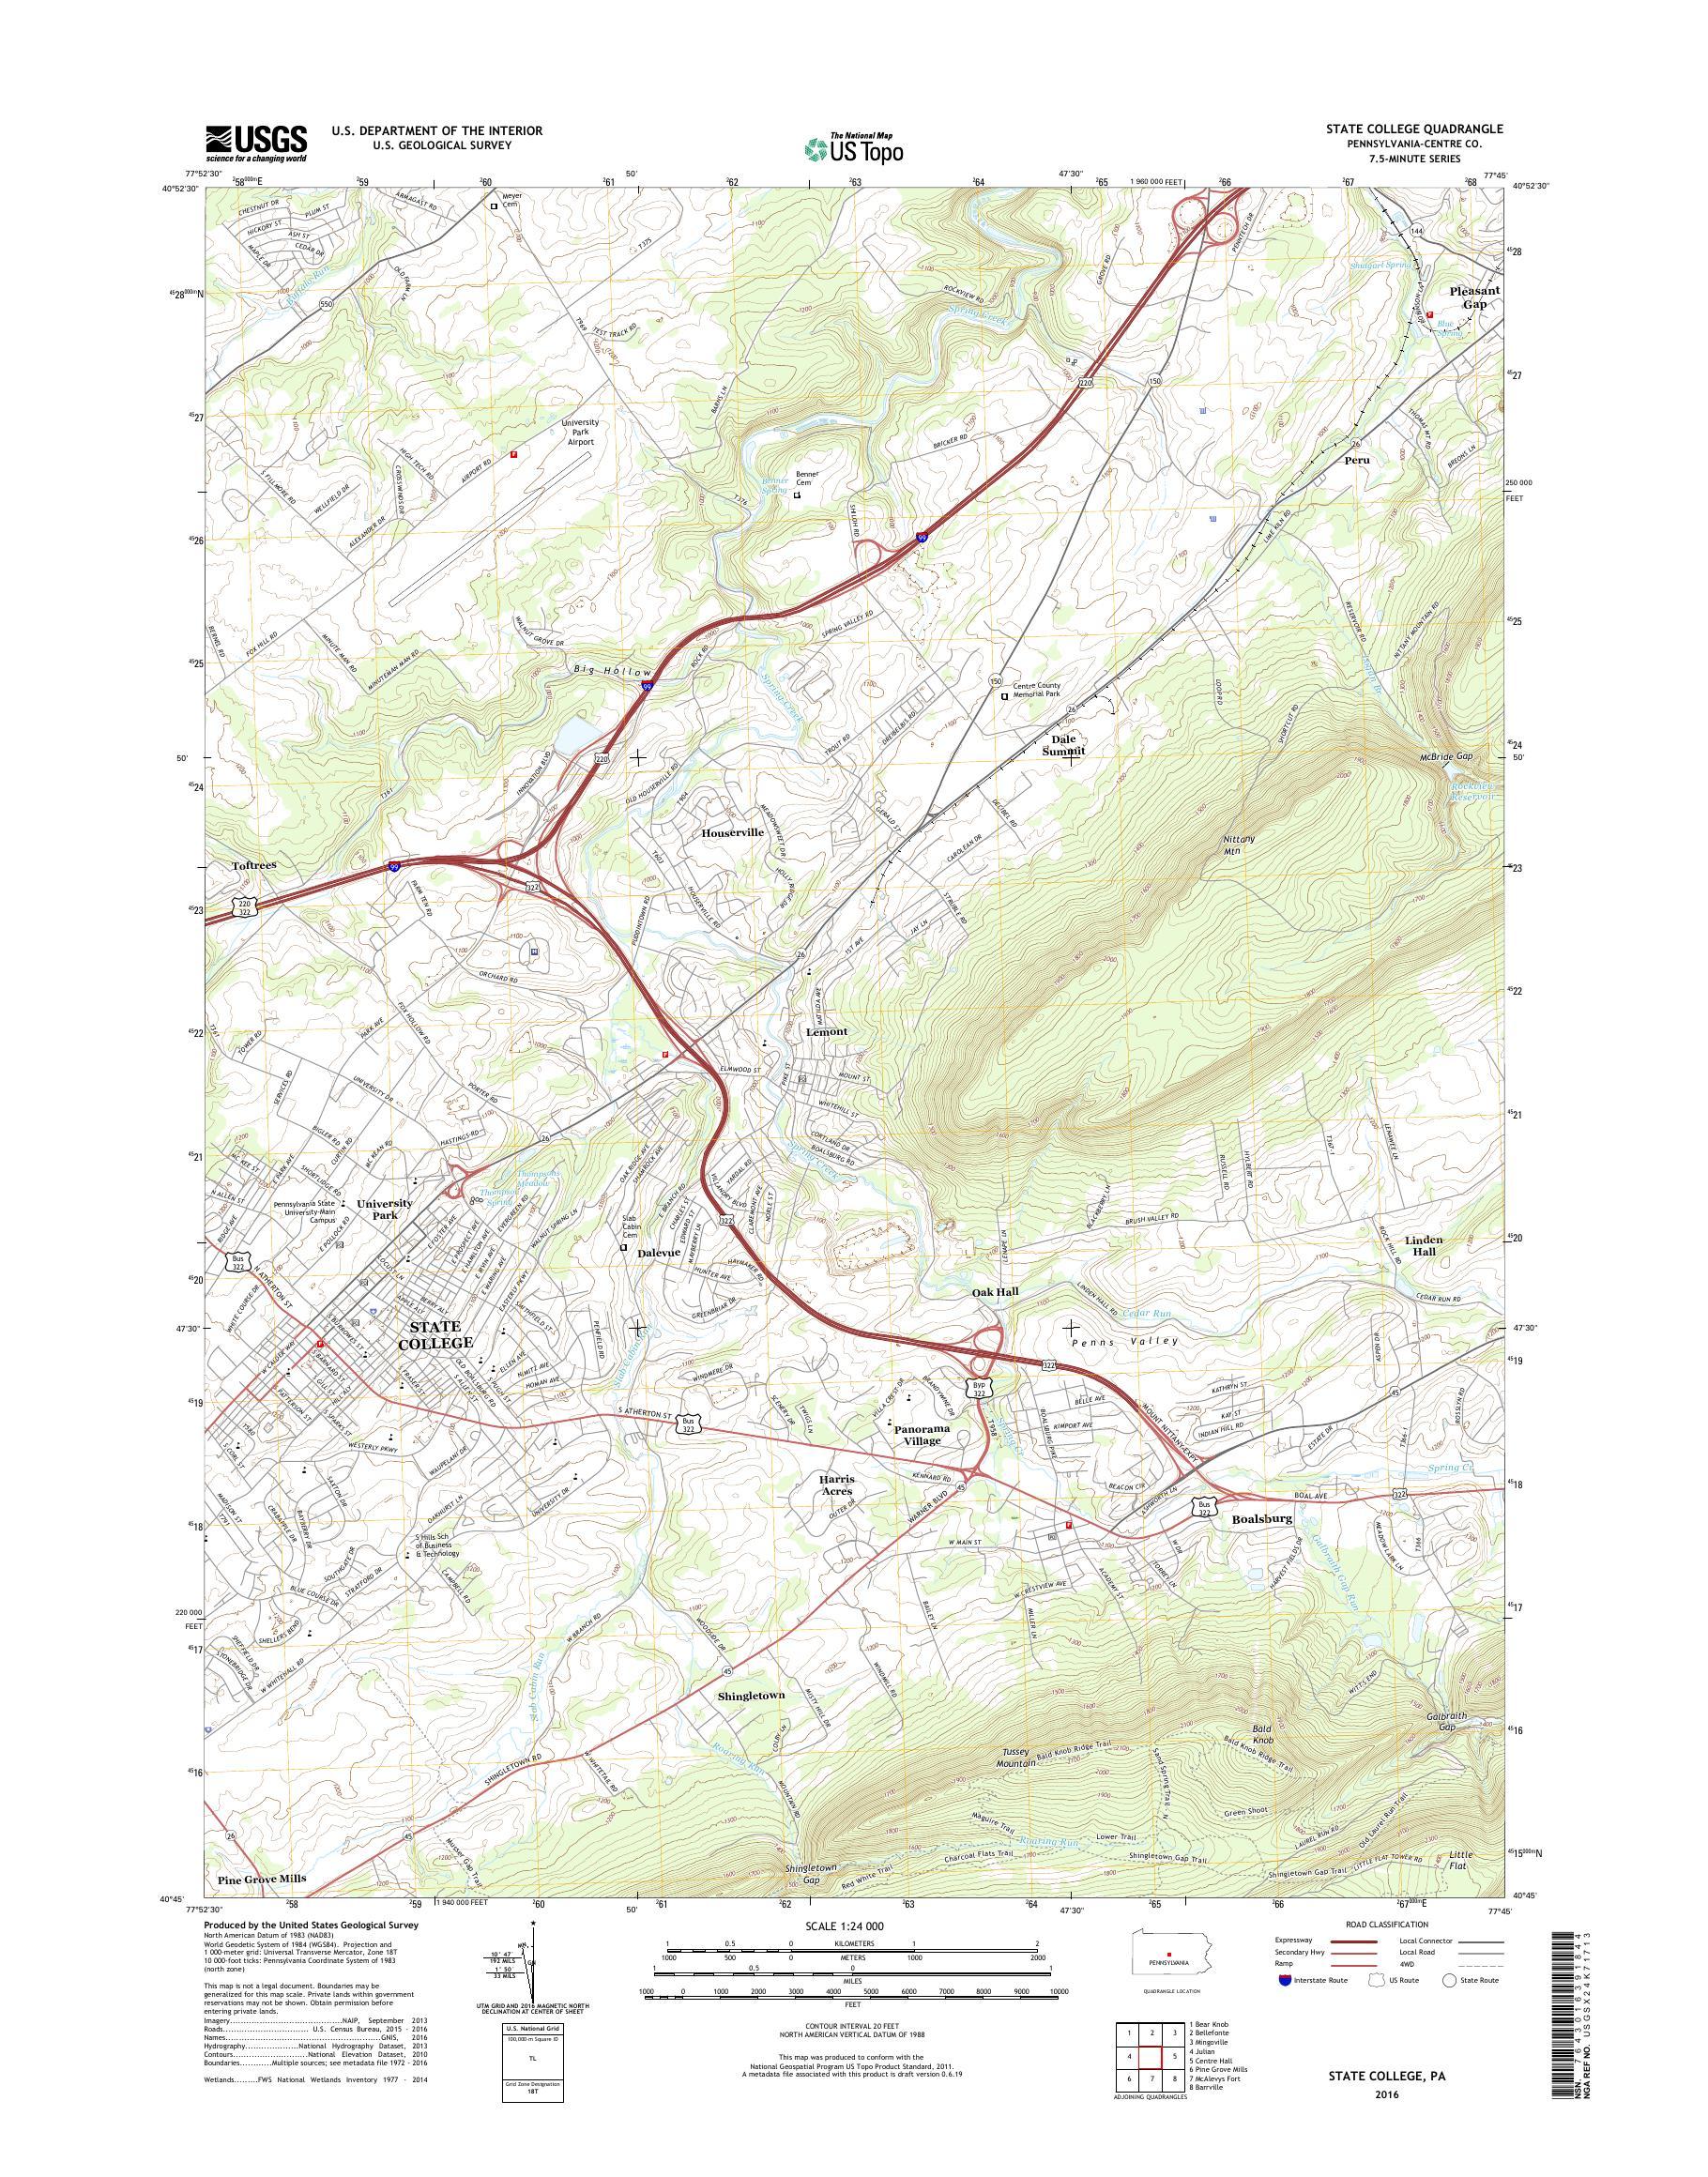 MyTopo State College, Pennsylvania USGS Quad Topo Map on